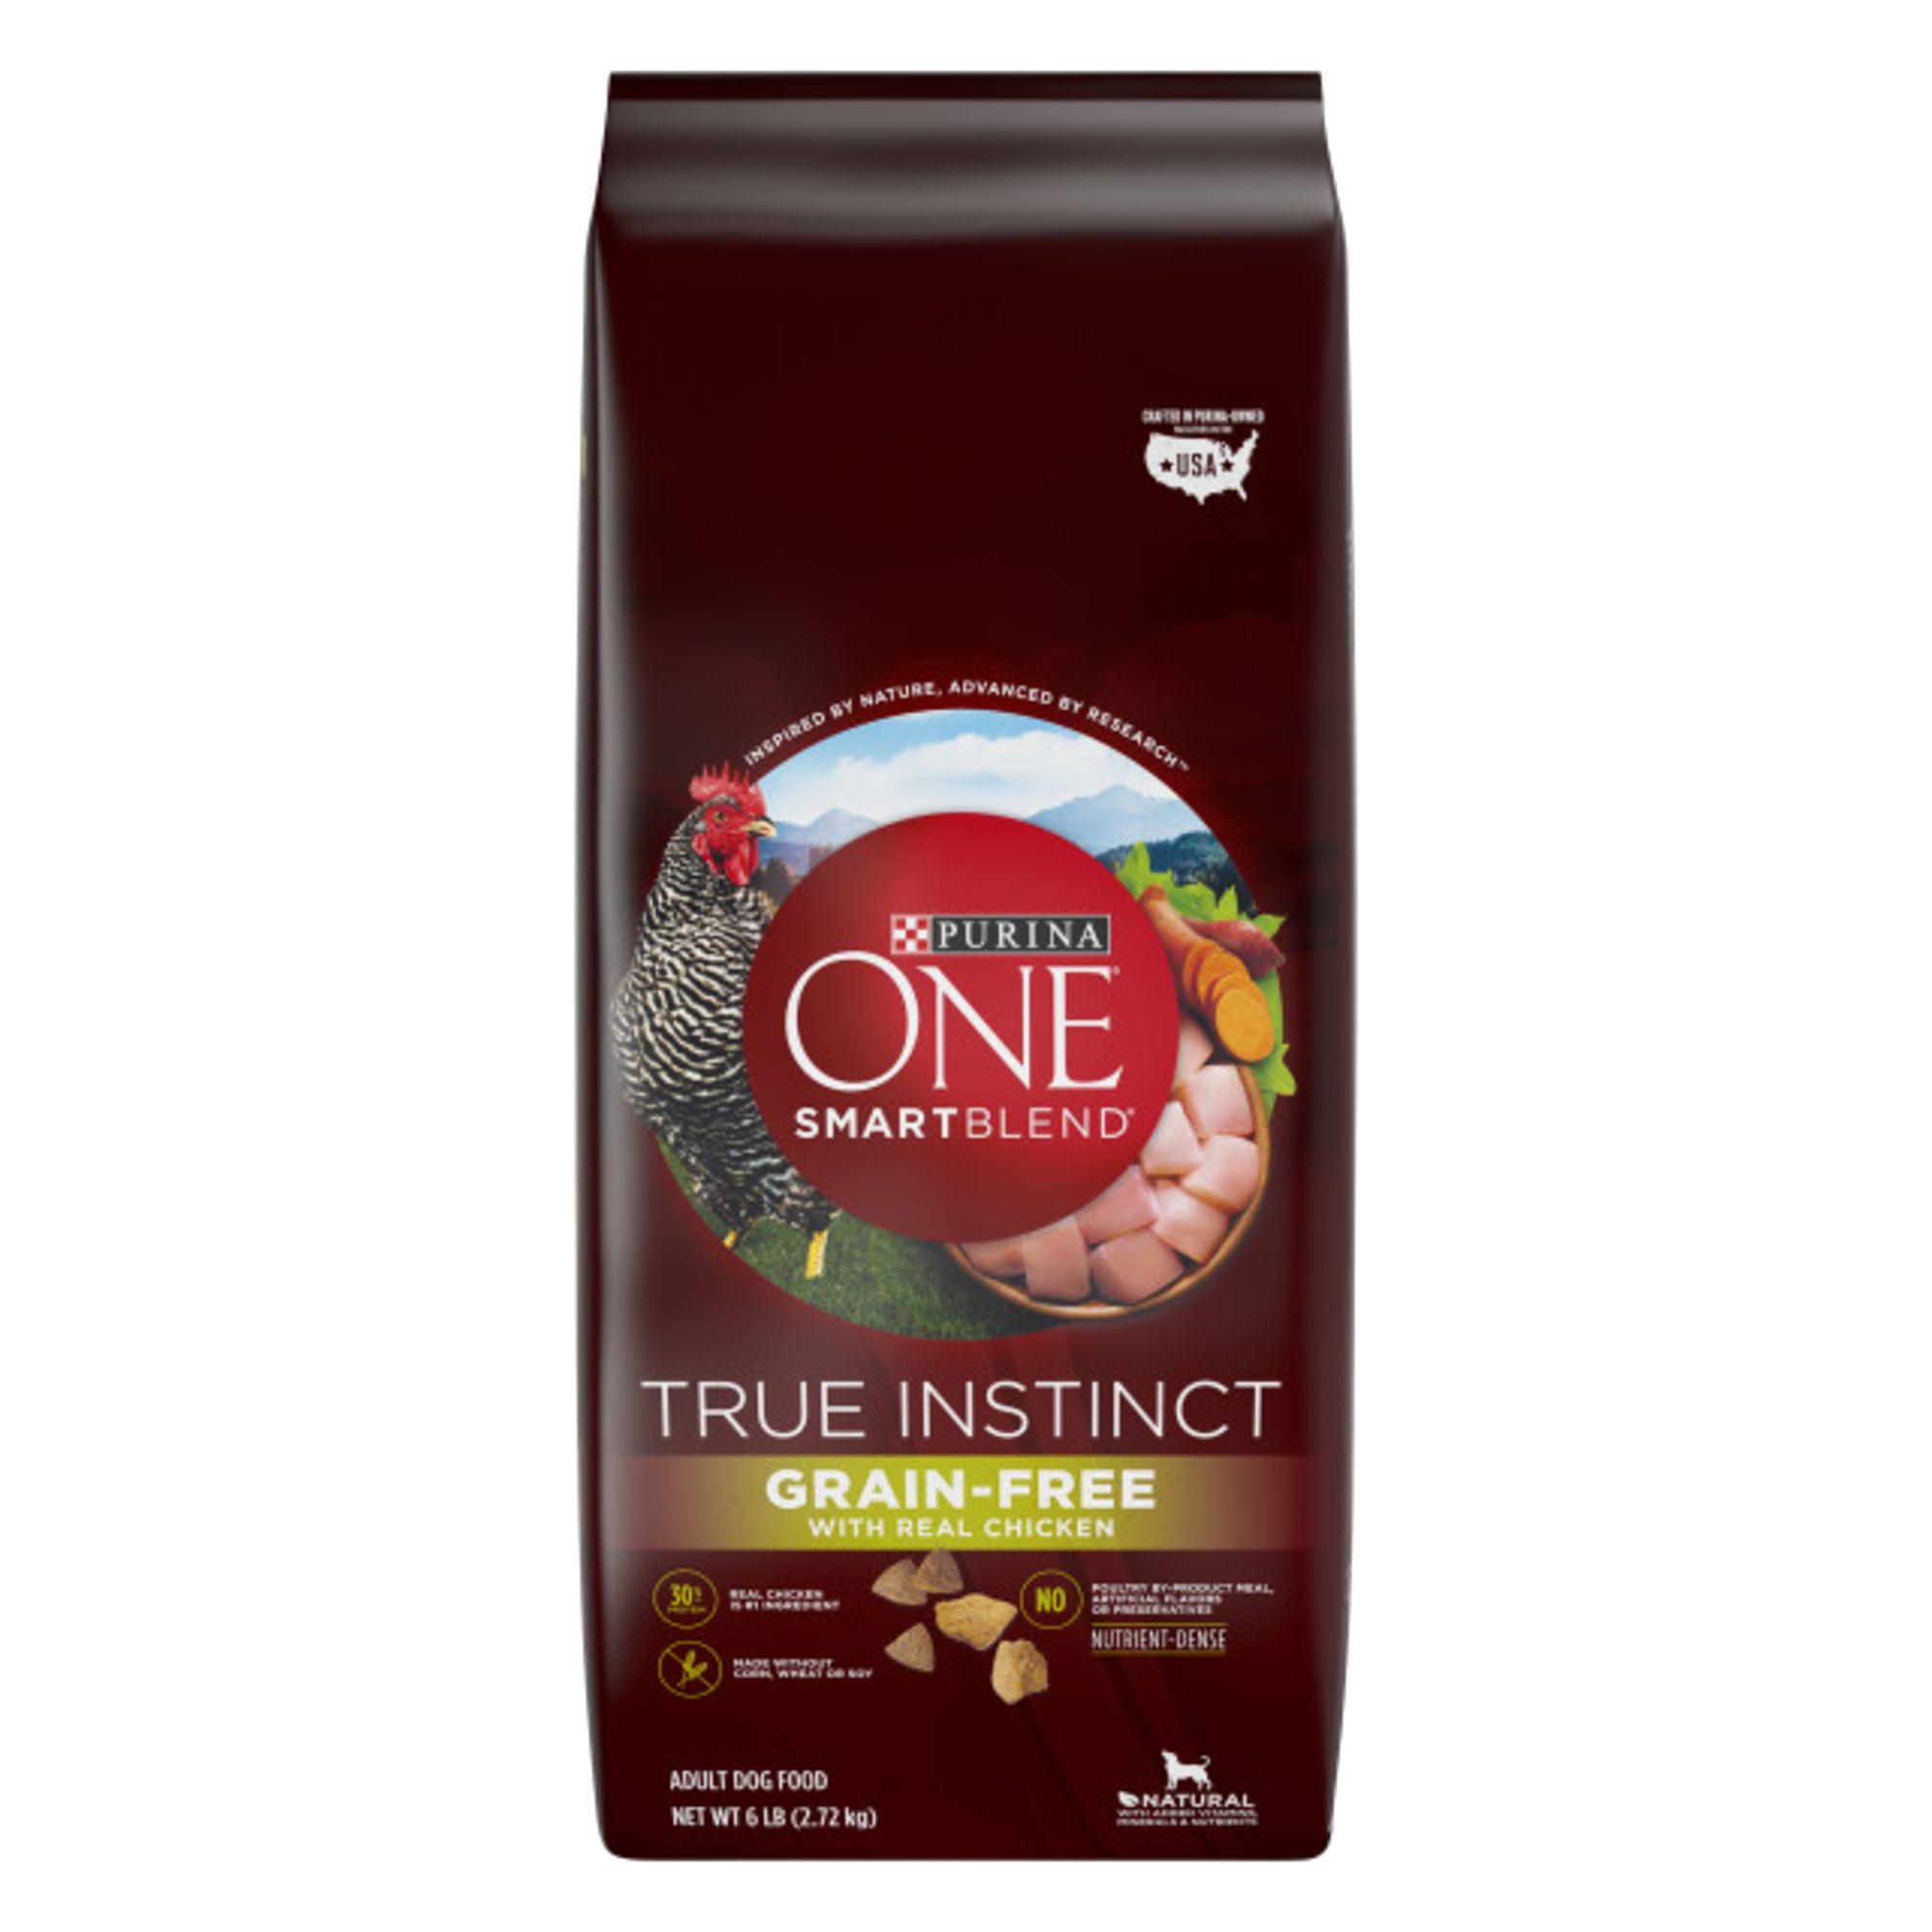 Purina One Smartblend True Instinct Adult Dog Food Grain Free Chicken Sweet Potato